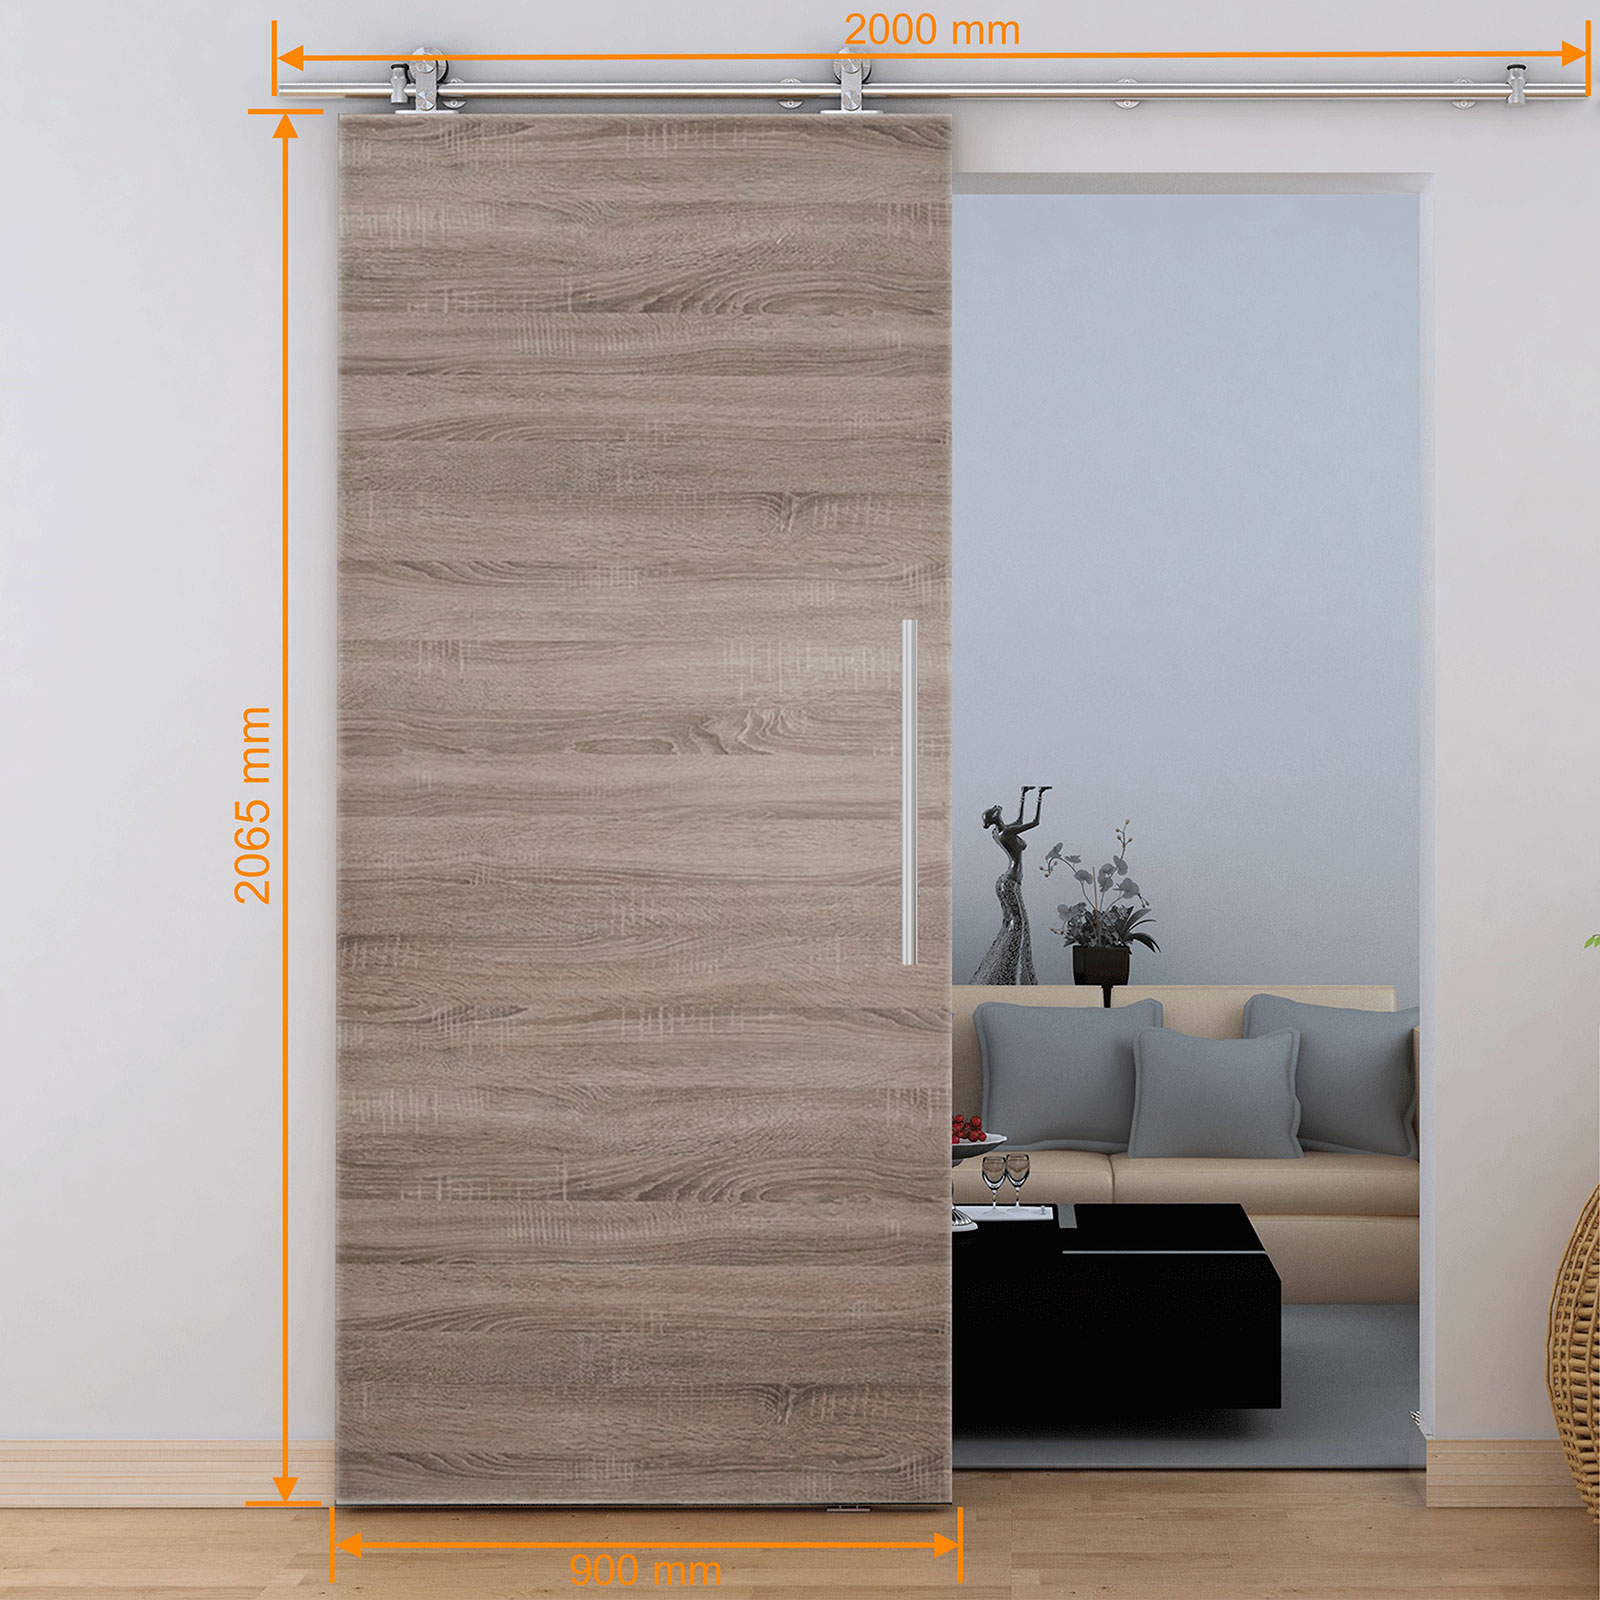 schiebet r holzschiebet r 900x2065 softstop schiebet rsystem zimmert r holz t r ebay. Black Bedroom Furniture Sets. Home Design Ideas